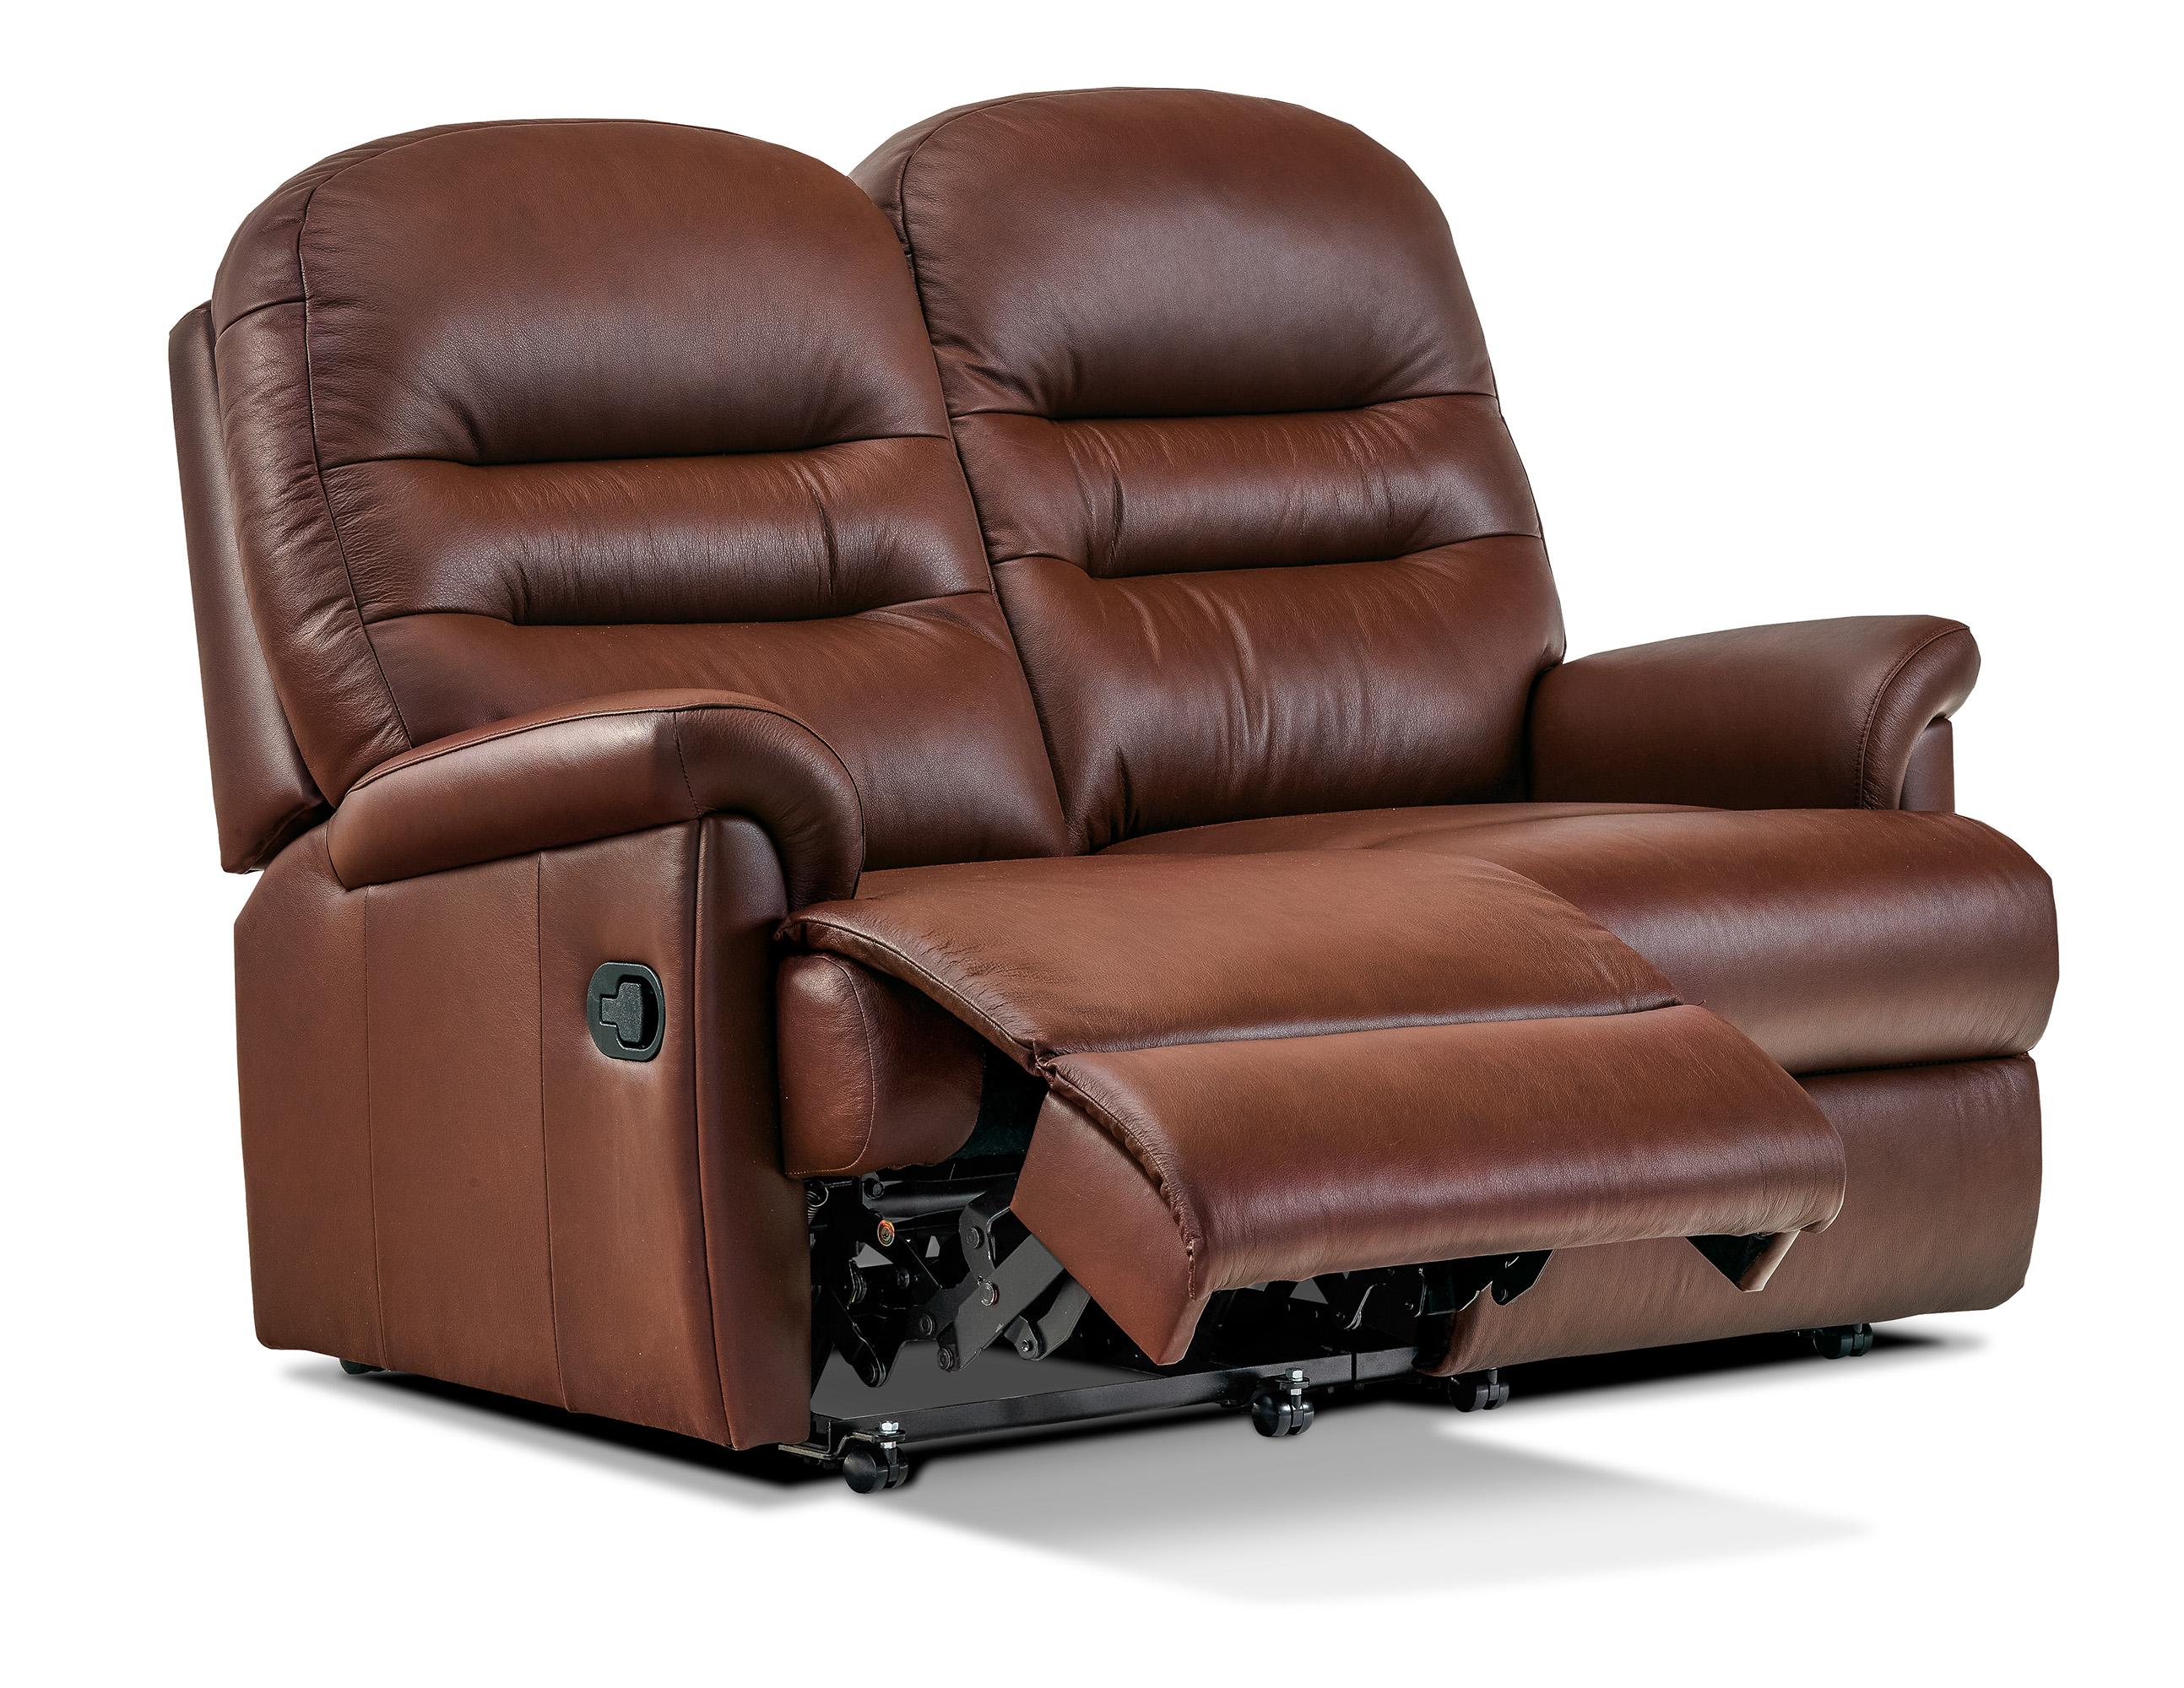 Keswick Petite Leather Reclining 2 Seater Settee